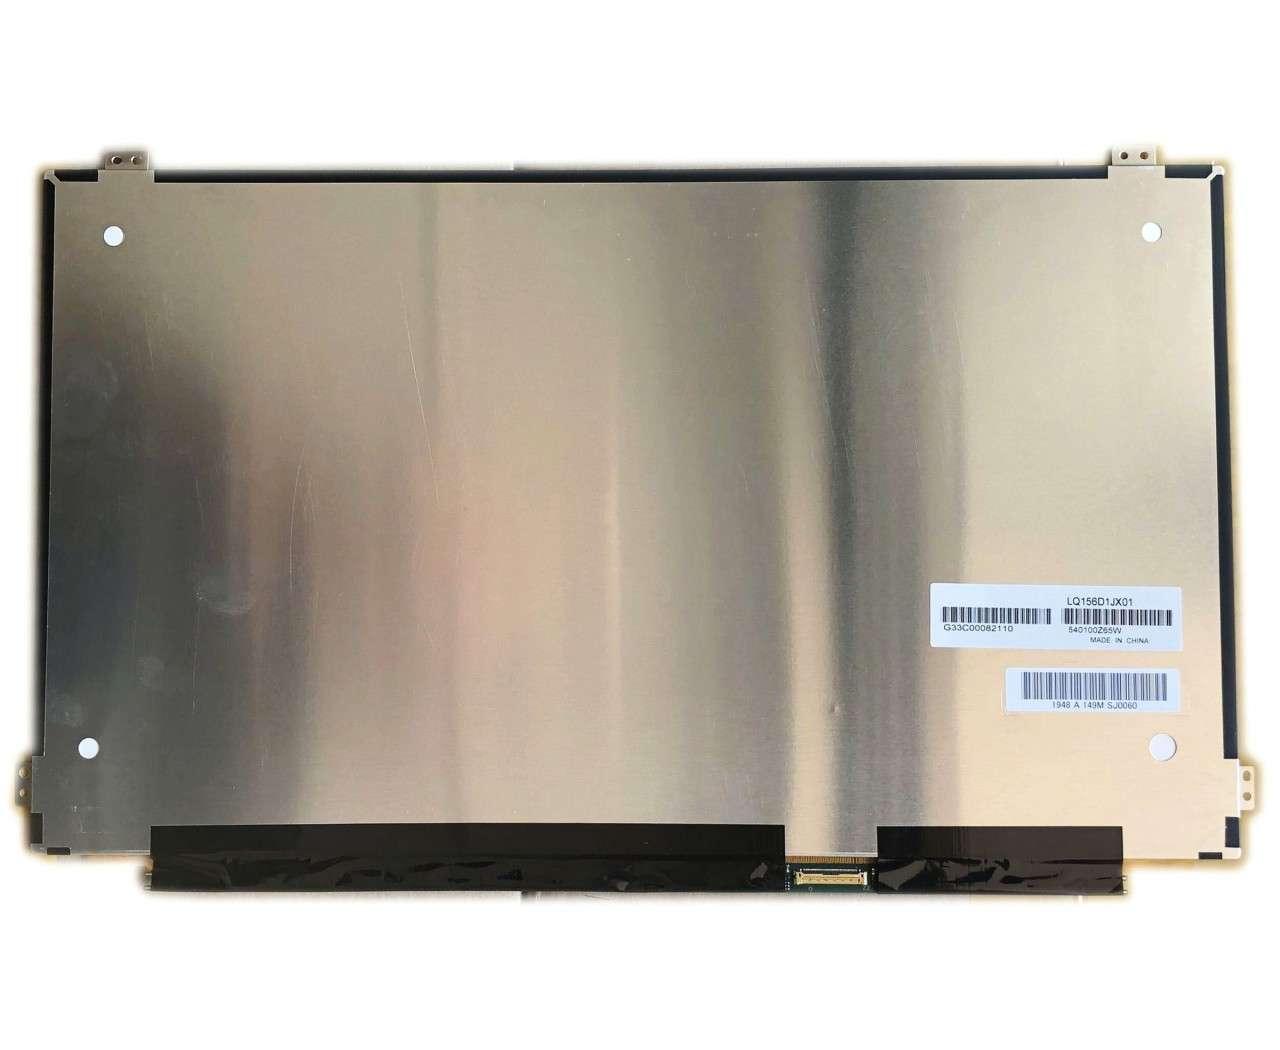 Display laptop Sharp LQ156D1JX01 Ecran 15.6 3840x2160 UHD 4K 40 pini EDP imagine powerlaptop.ro 2021